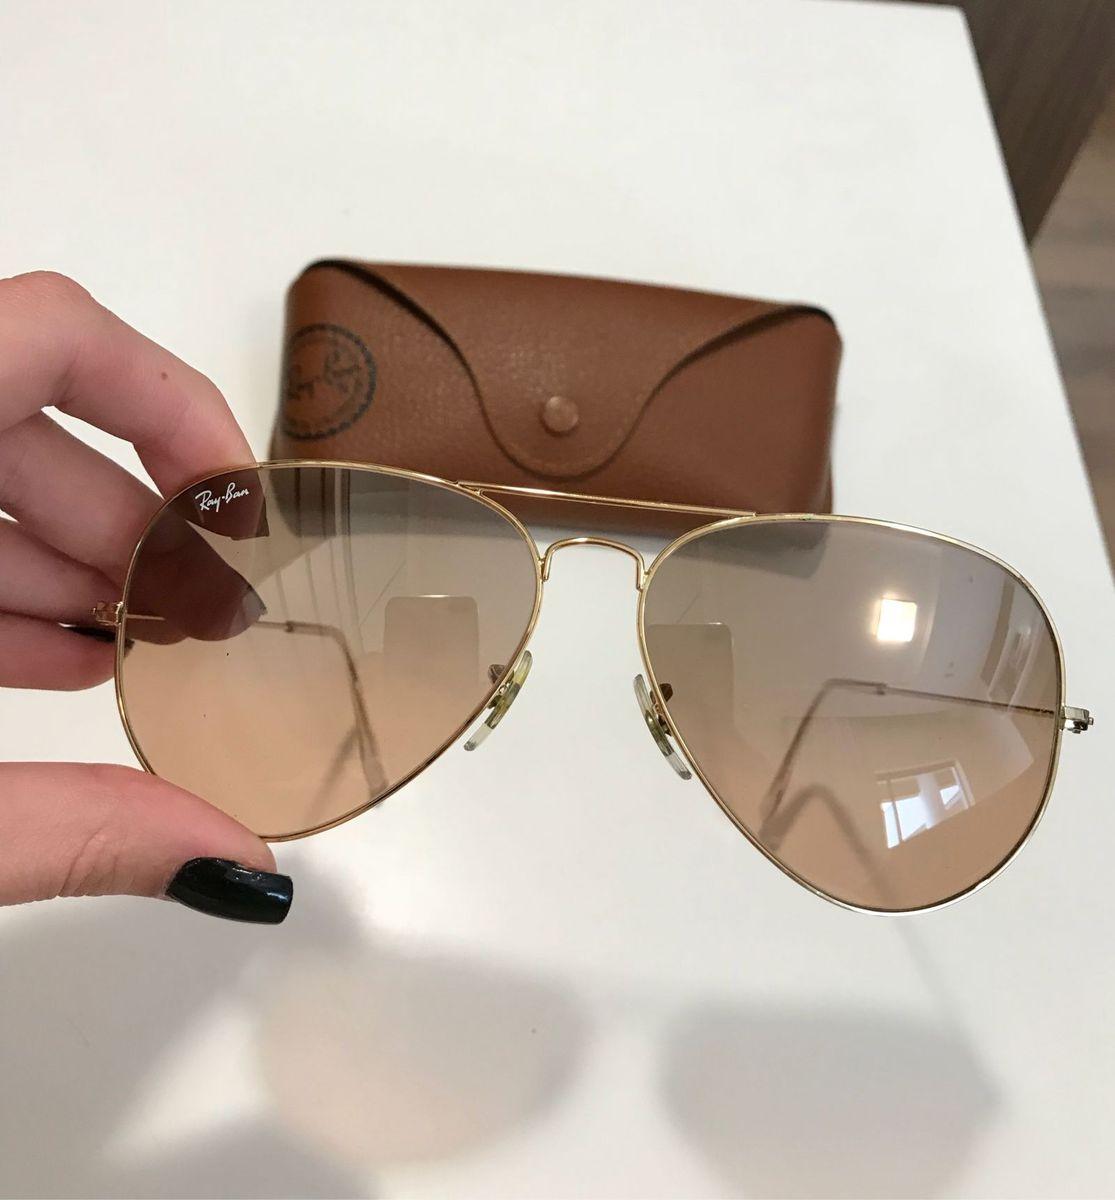 74927151f óculos ray-ban original aviador - óculos ray-ban.  Czm6ly9wag90b3muzw5qb2vplmnvbs5ici9wcm9kdwn0cy85mtqwndg5lzixzjg3y2jknte2ztgym2m2zjrmndq2mzhhogi5ogi5lmpwzw